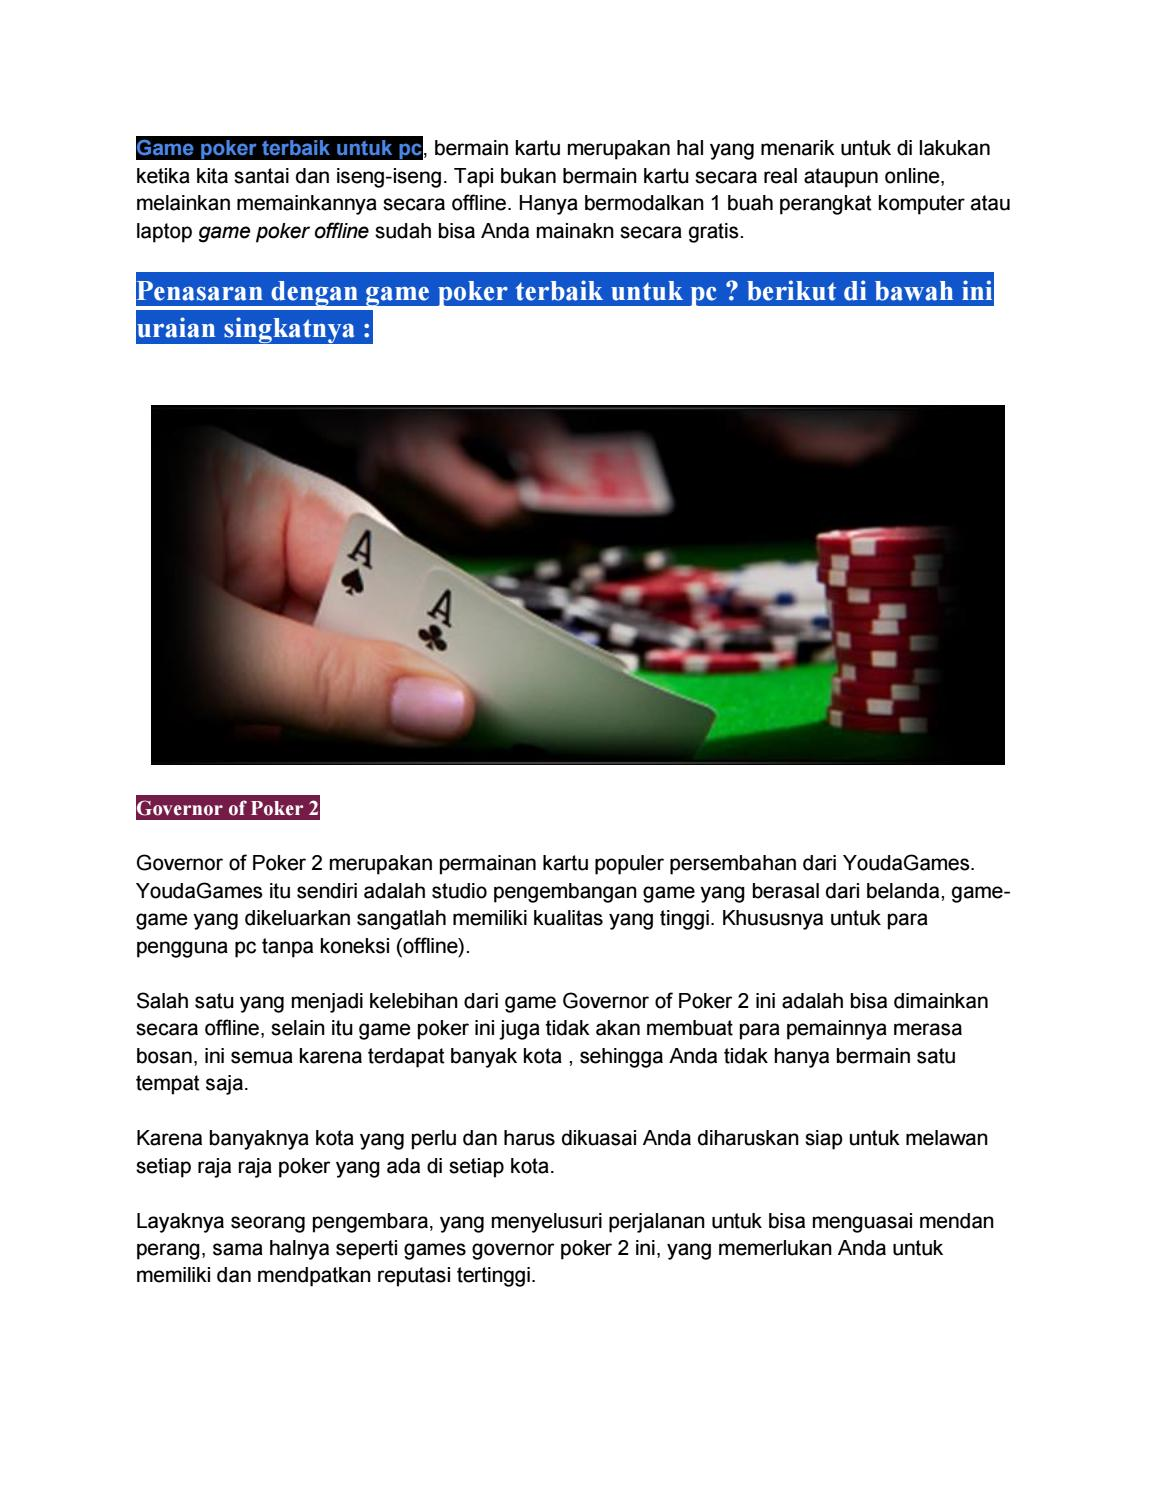 Game Poker Terbaik Untuk Pc By Suwarnoe Issuu